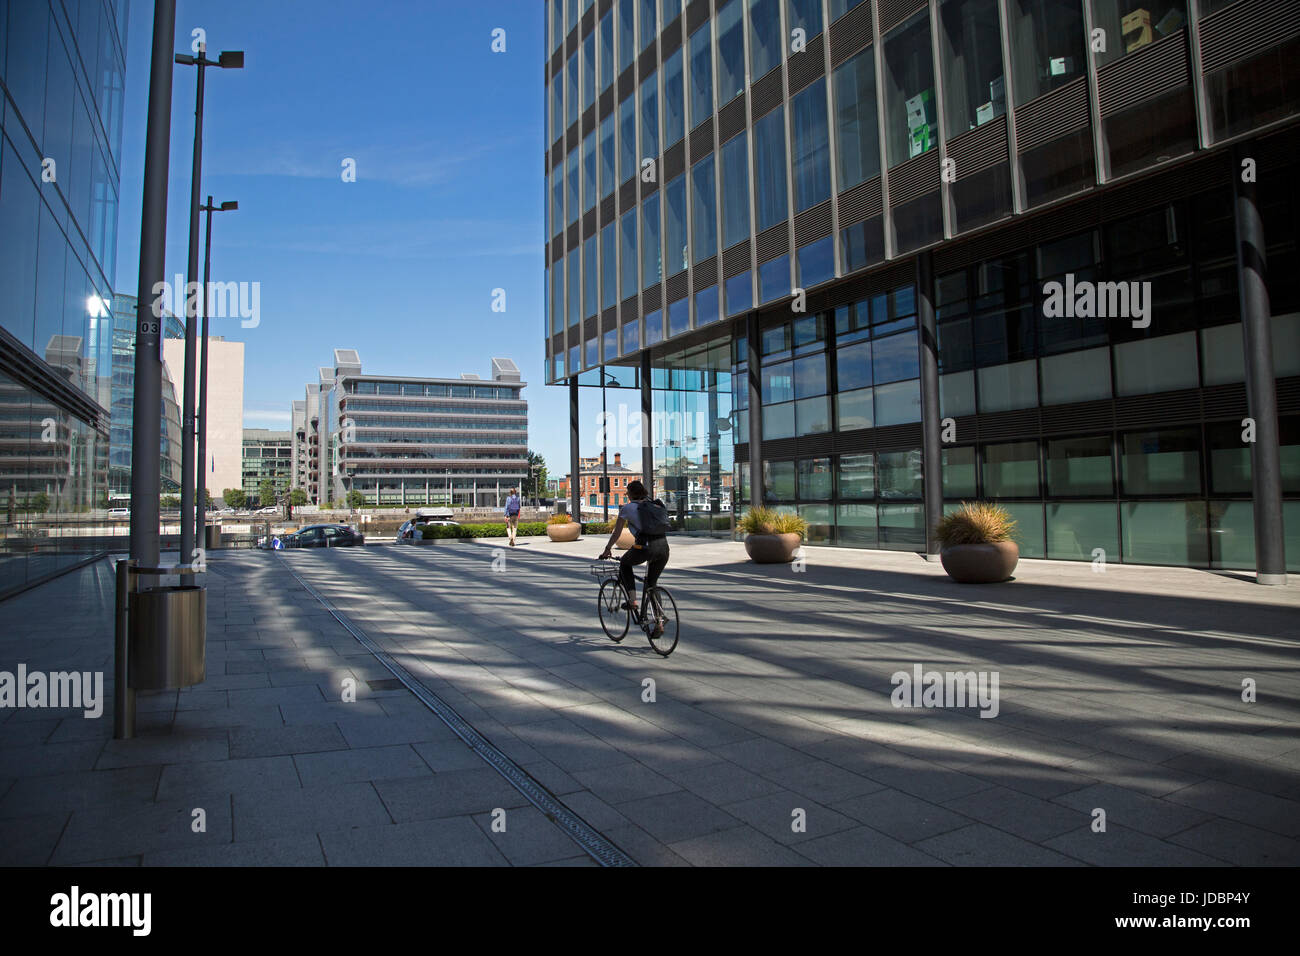 Cycling through Dublin docklands area, Ireland. - Stock Image